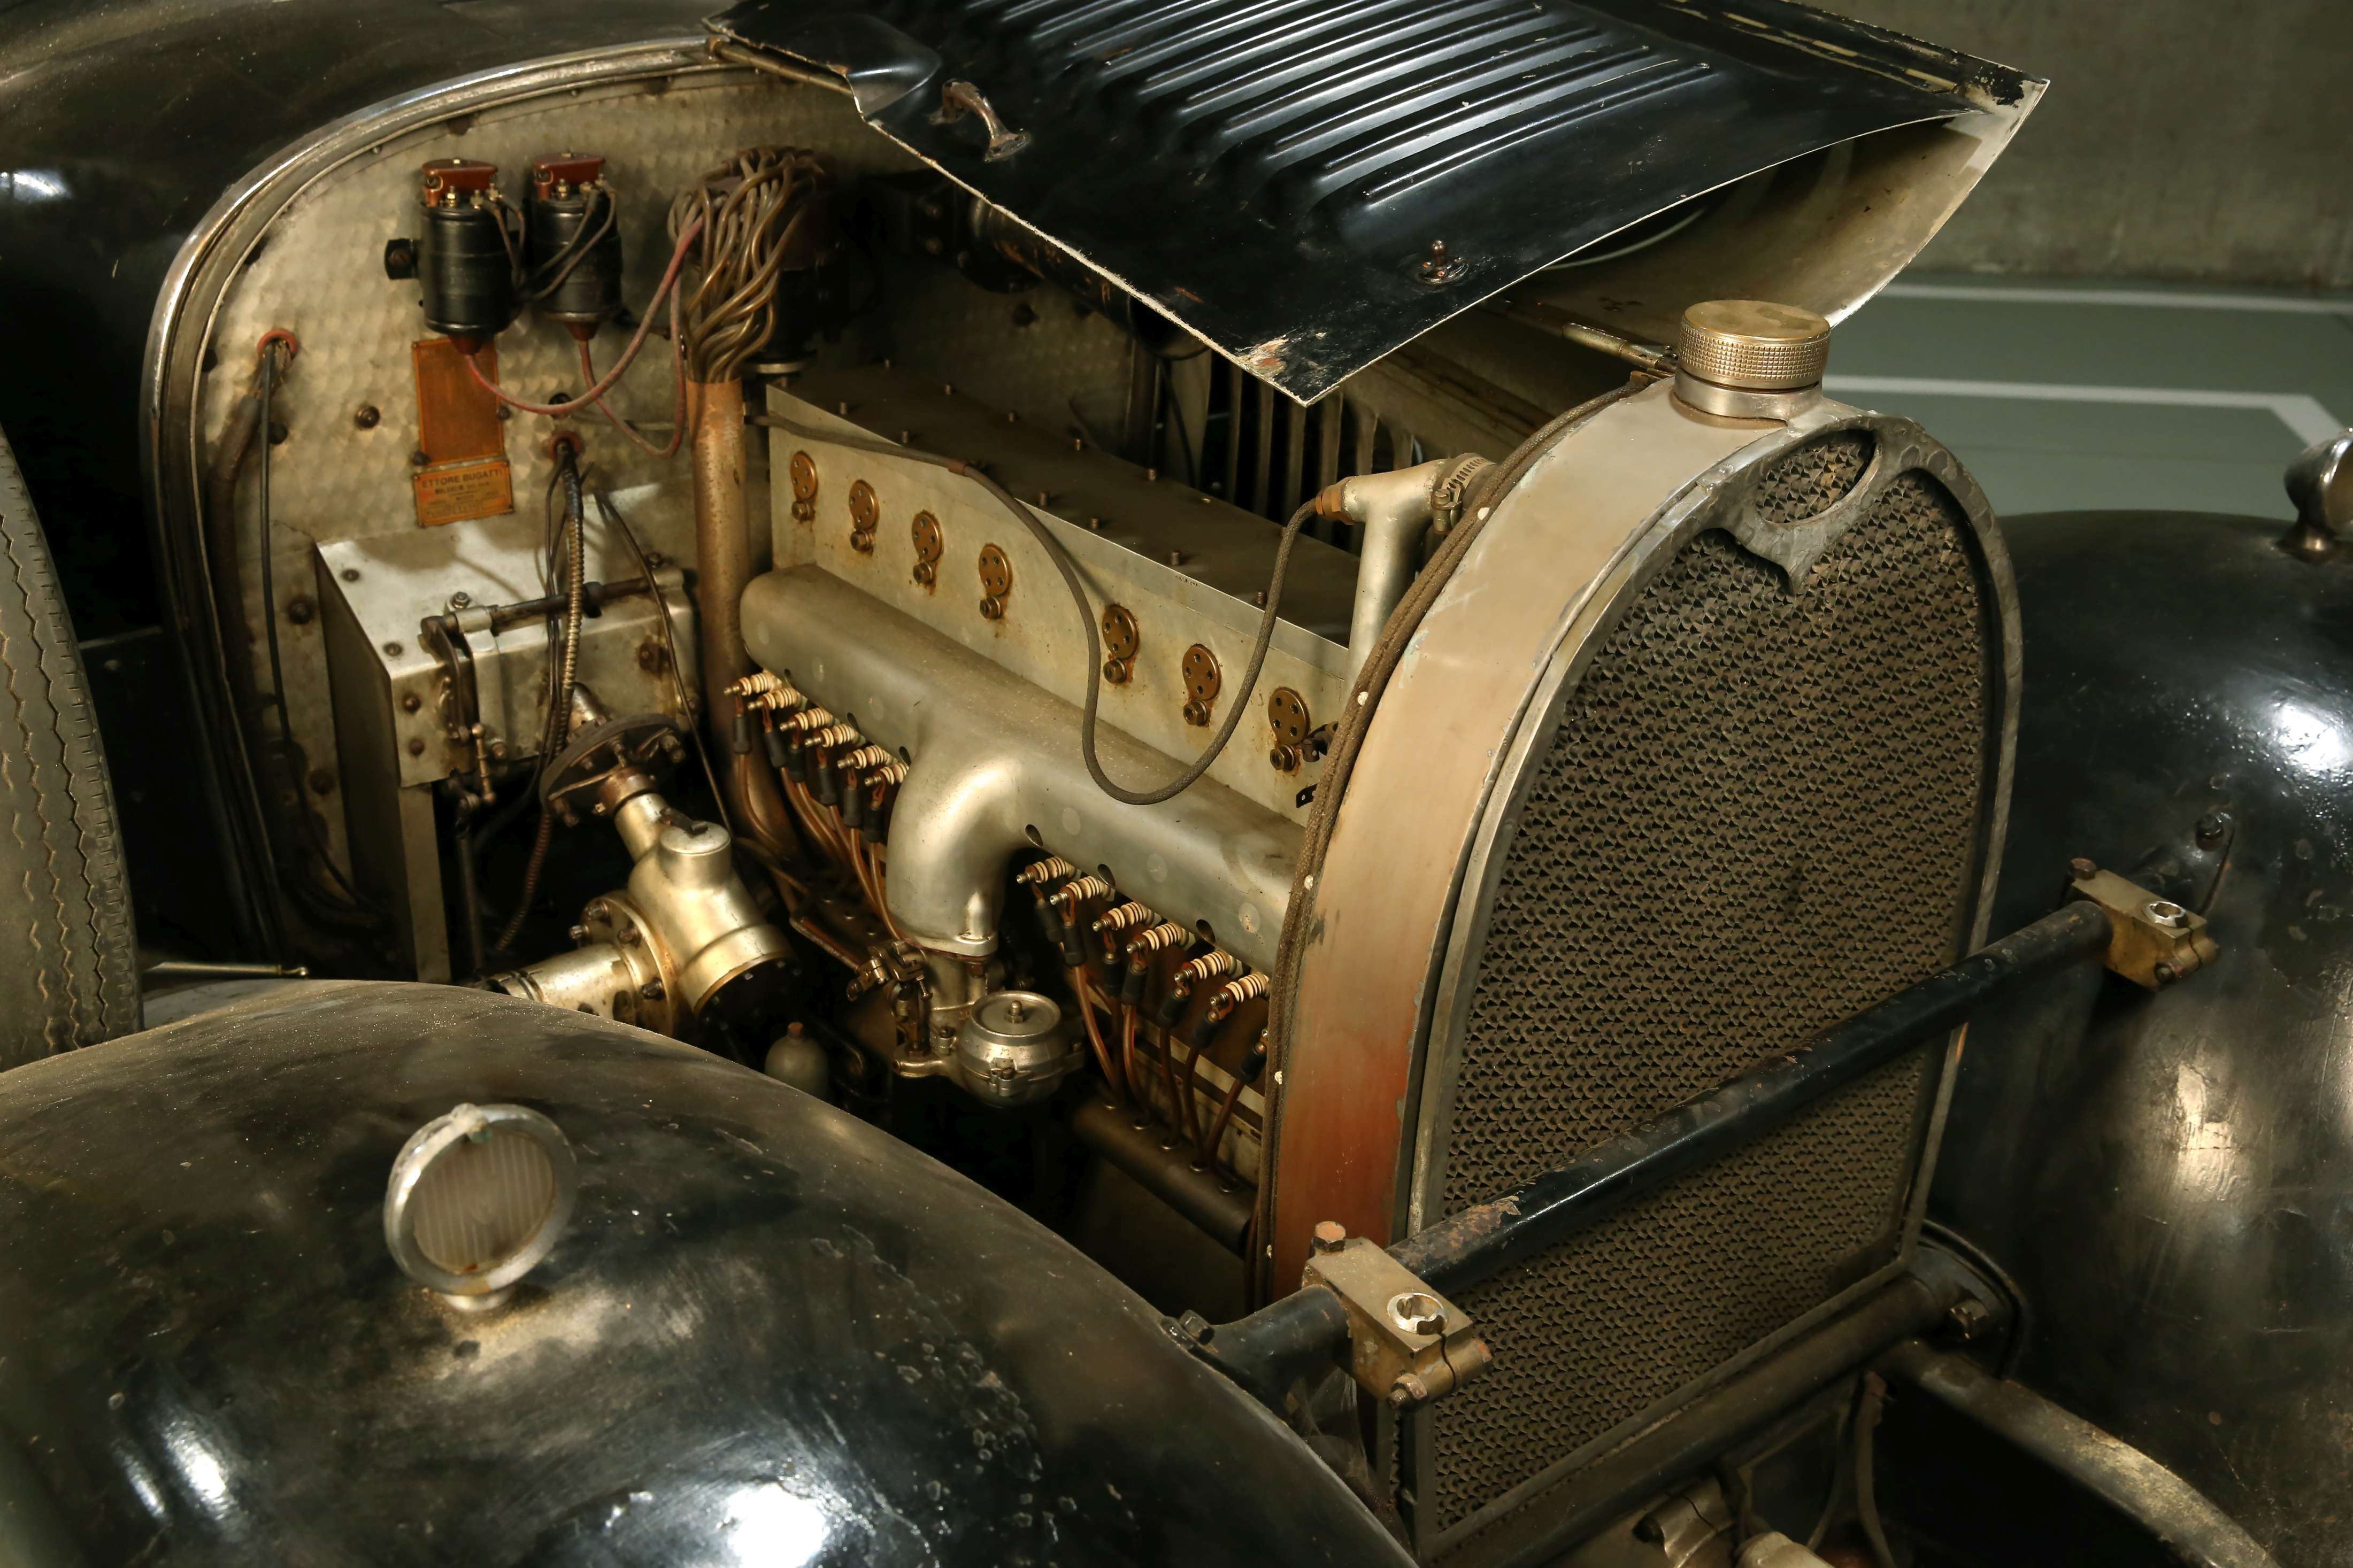 1932 Bugatti Type 49 Berline 2/4 portes Vanvooren engine